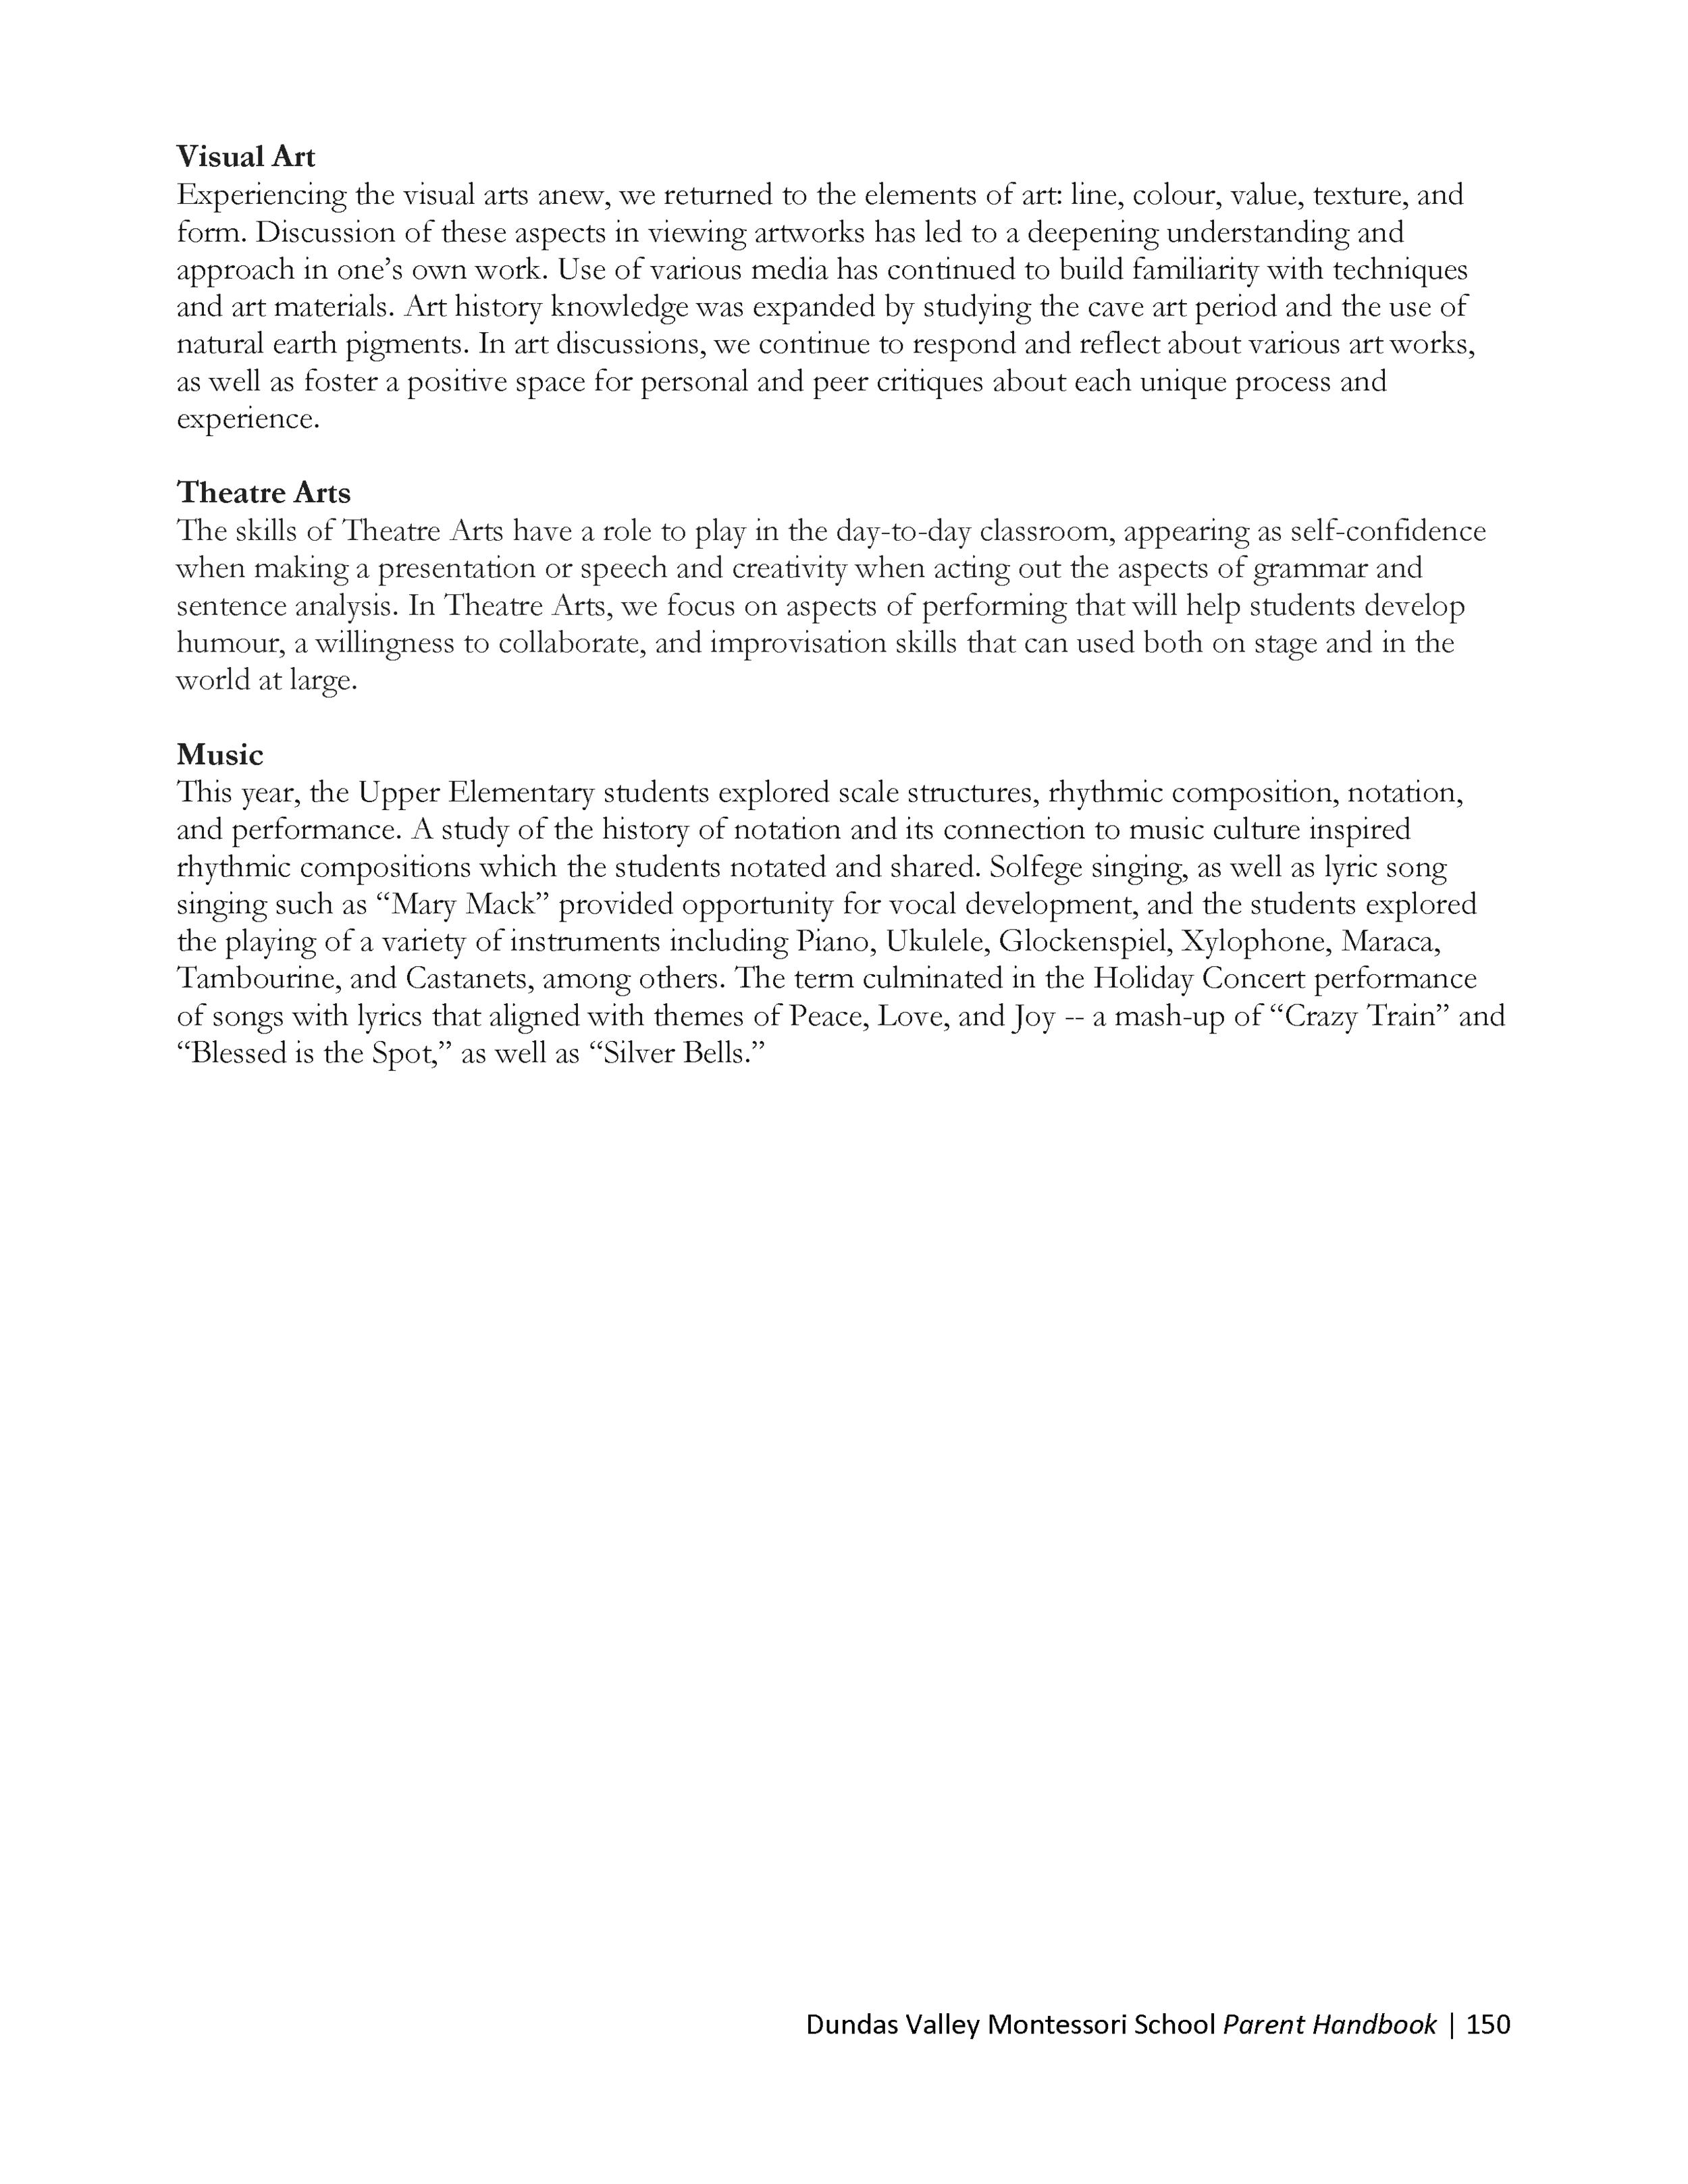 DVMS-Parent-Handbook-19-20_Page_152.png